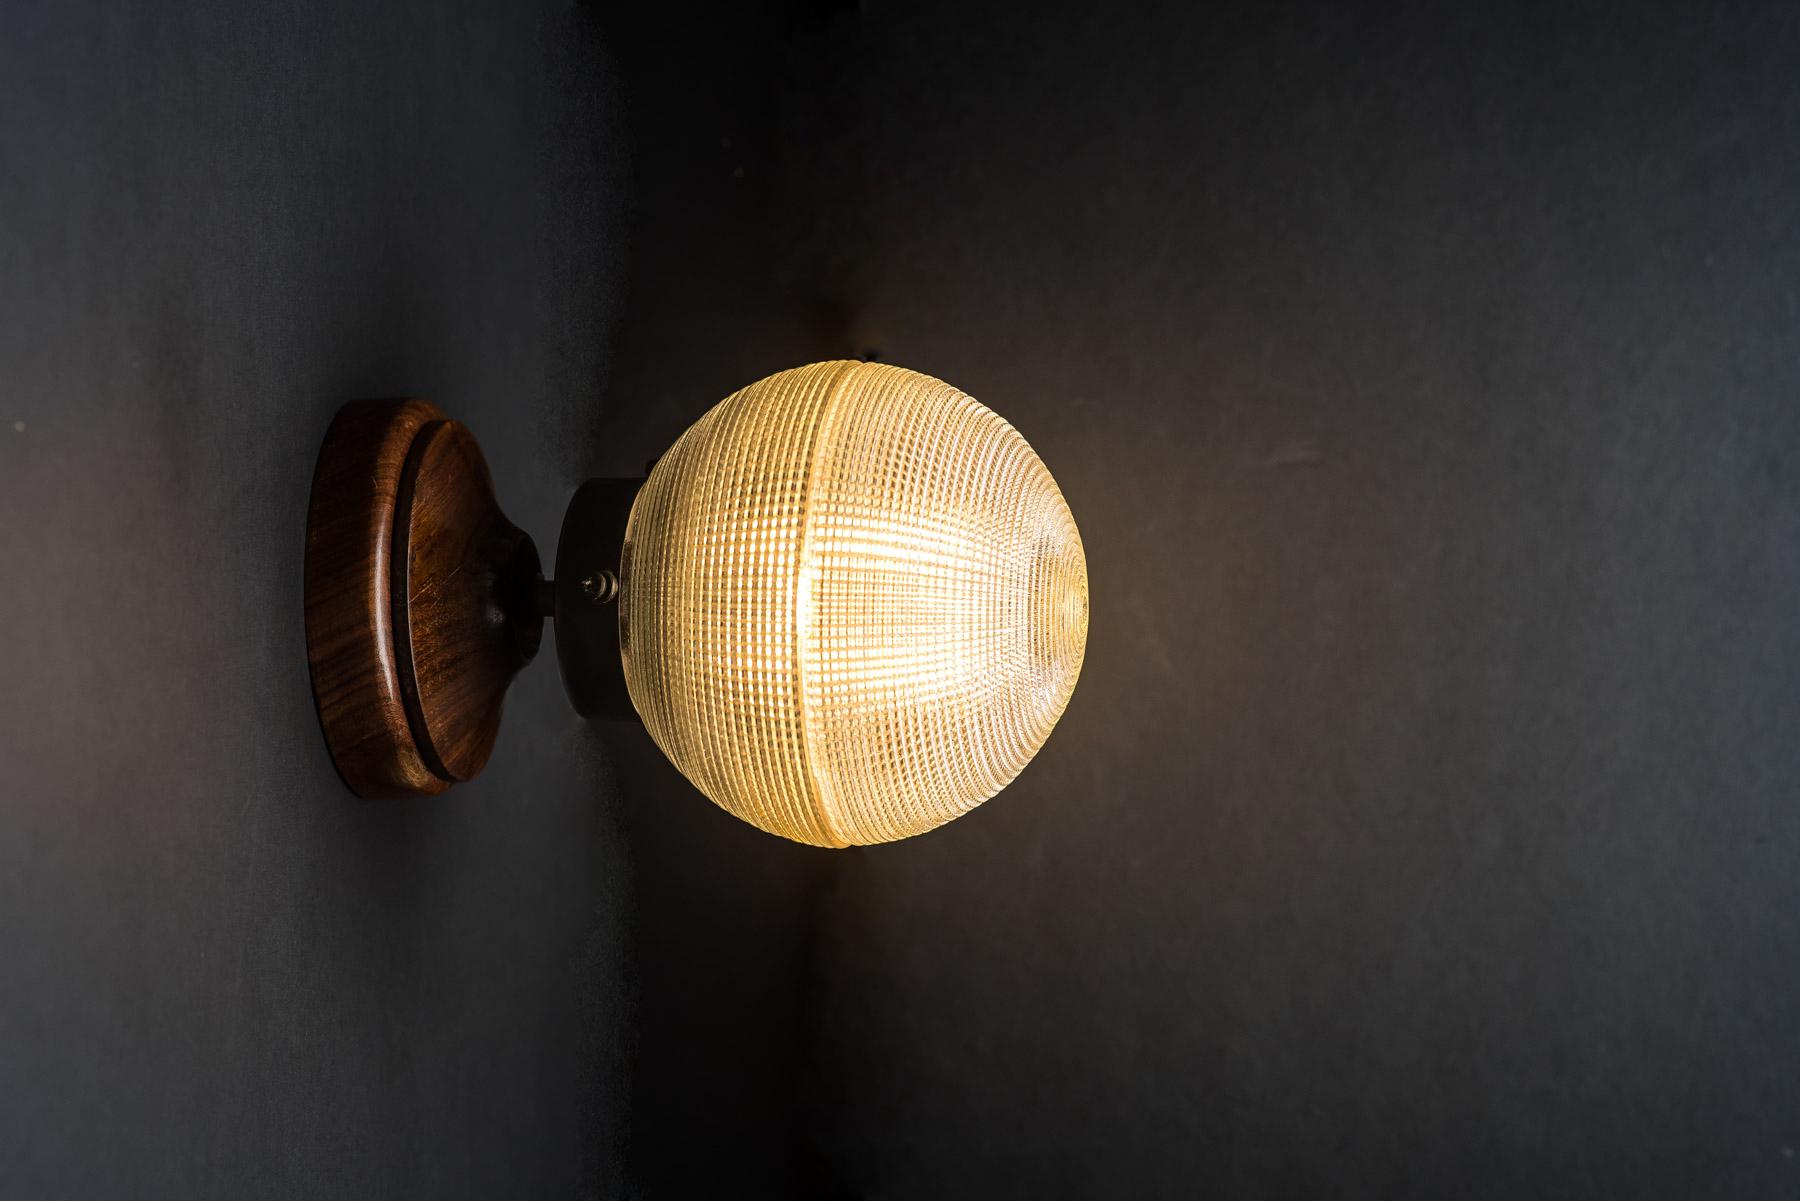 walnut and holophane glass bar top light  05.jpg